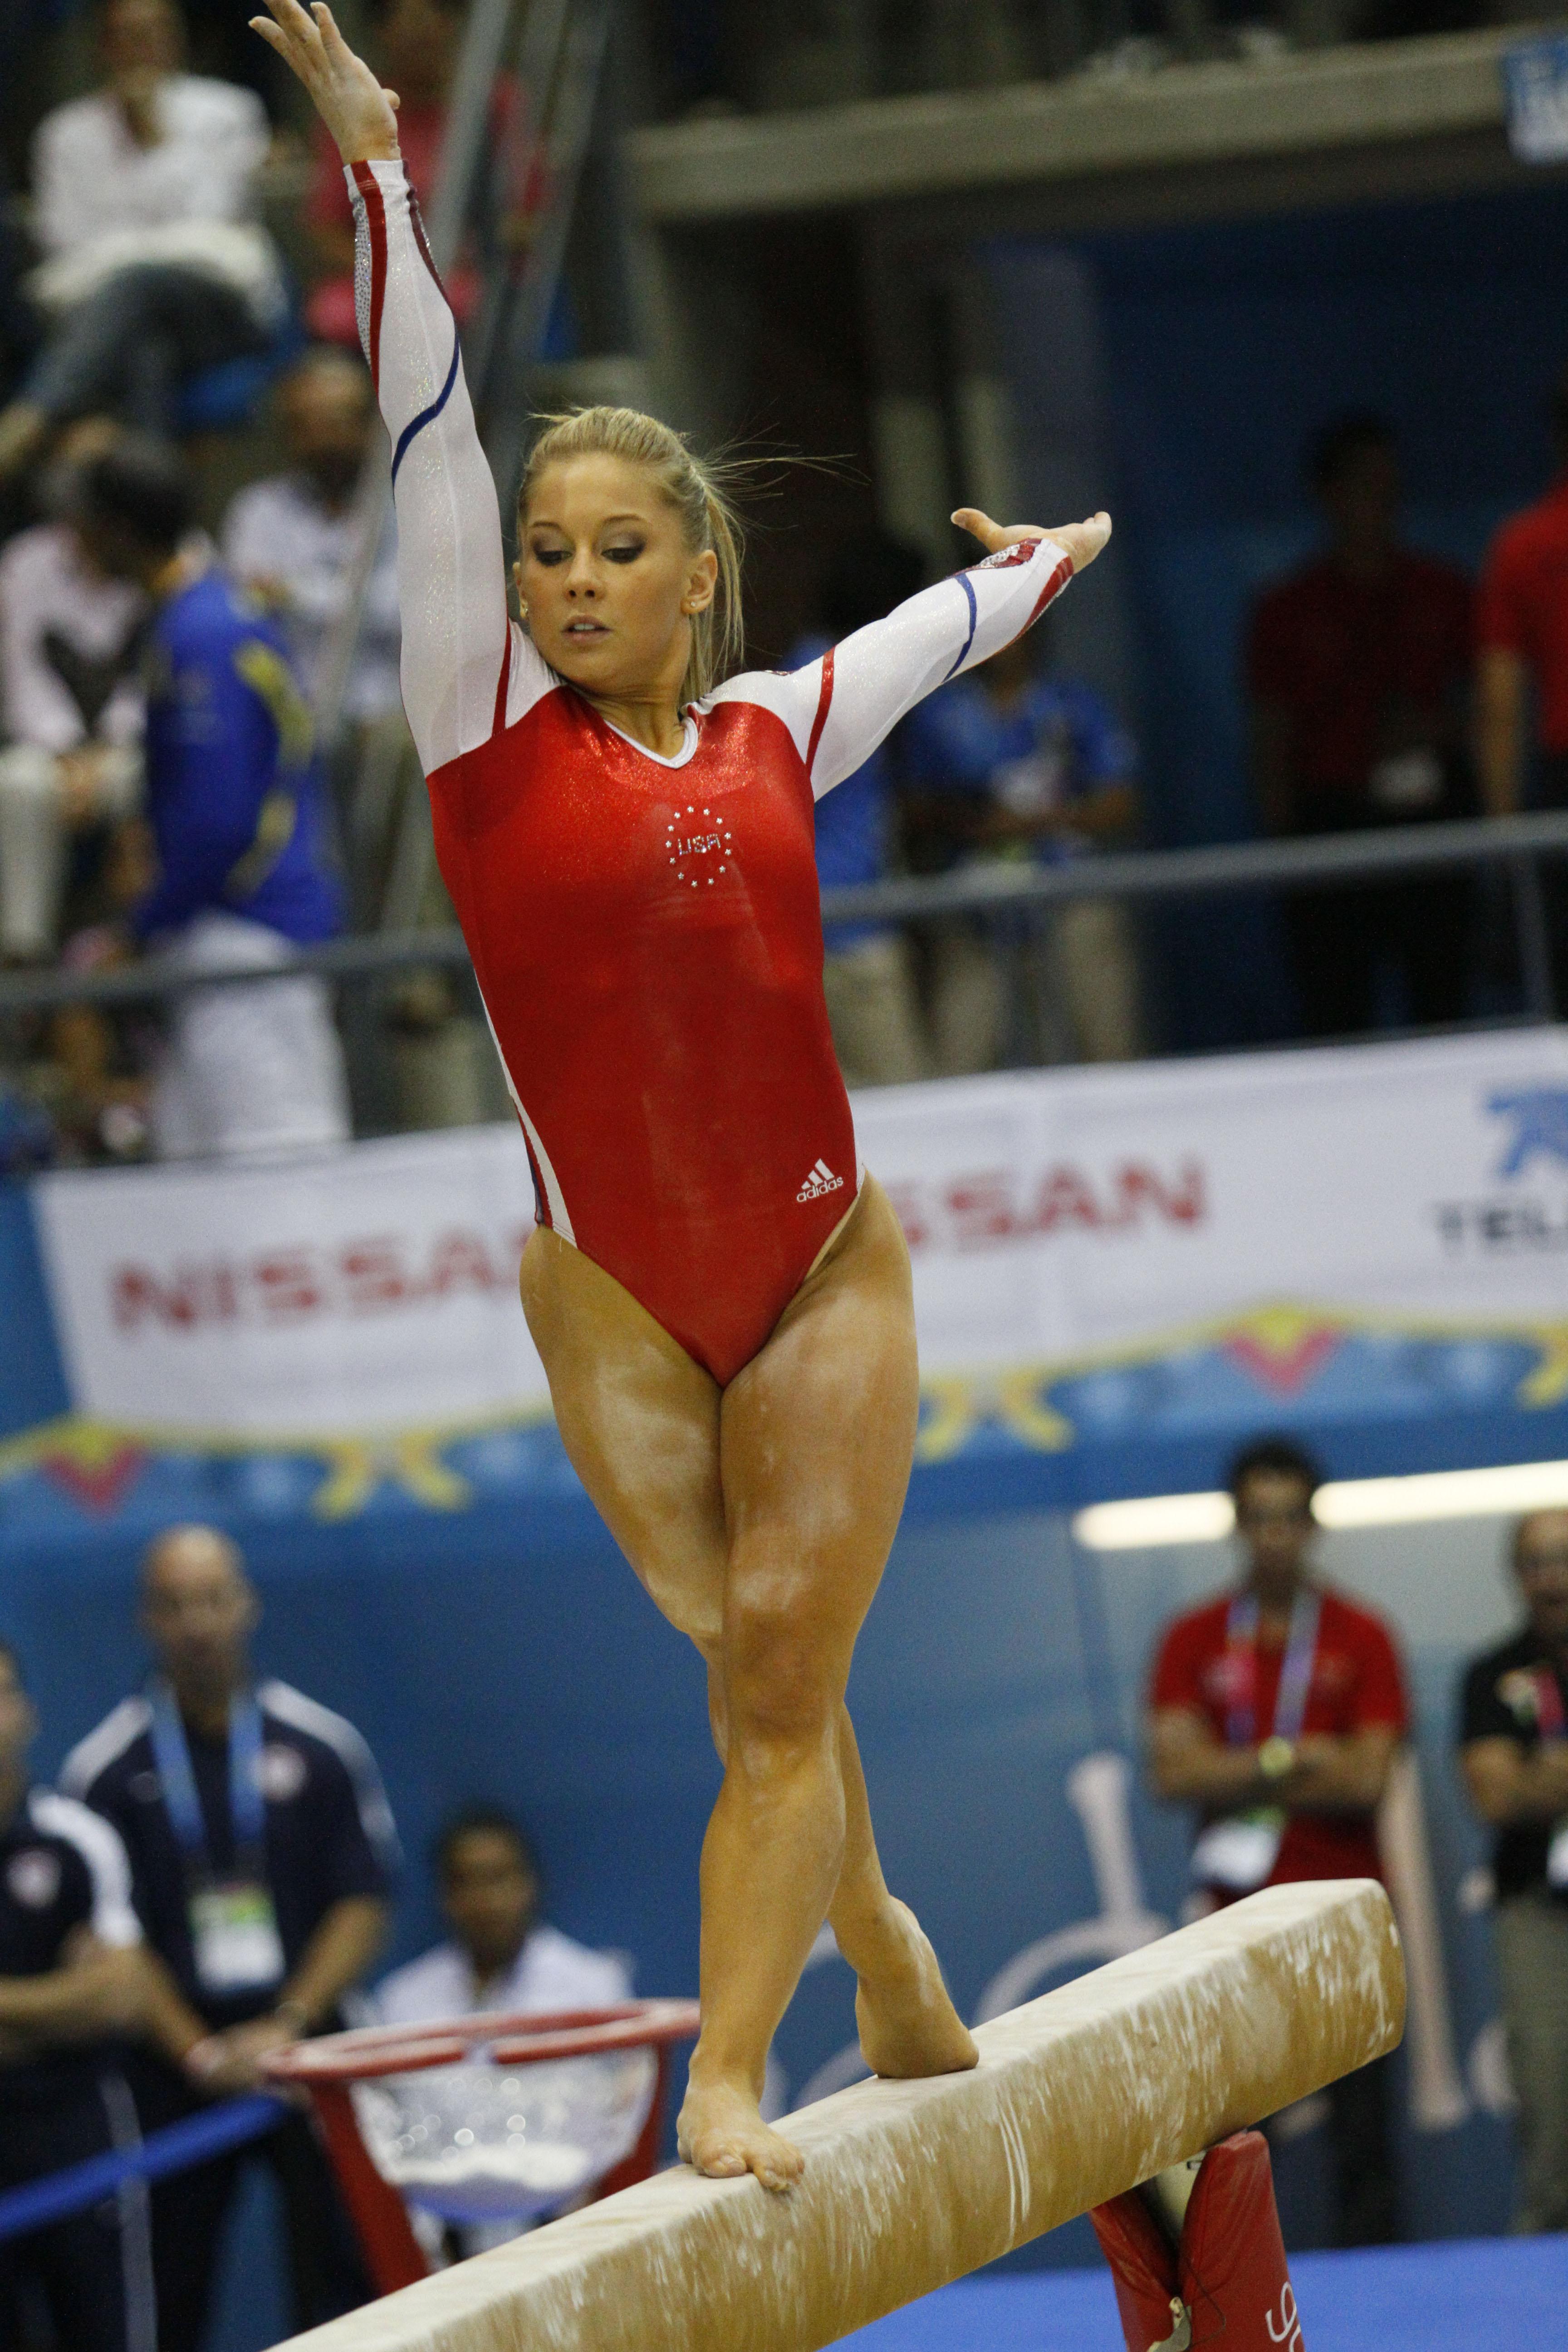 Gymnastics leotards malfunction